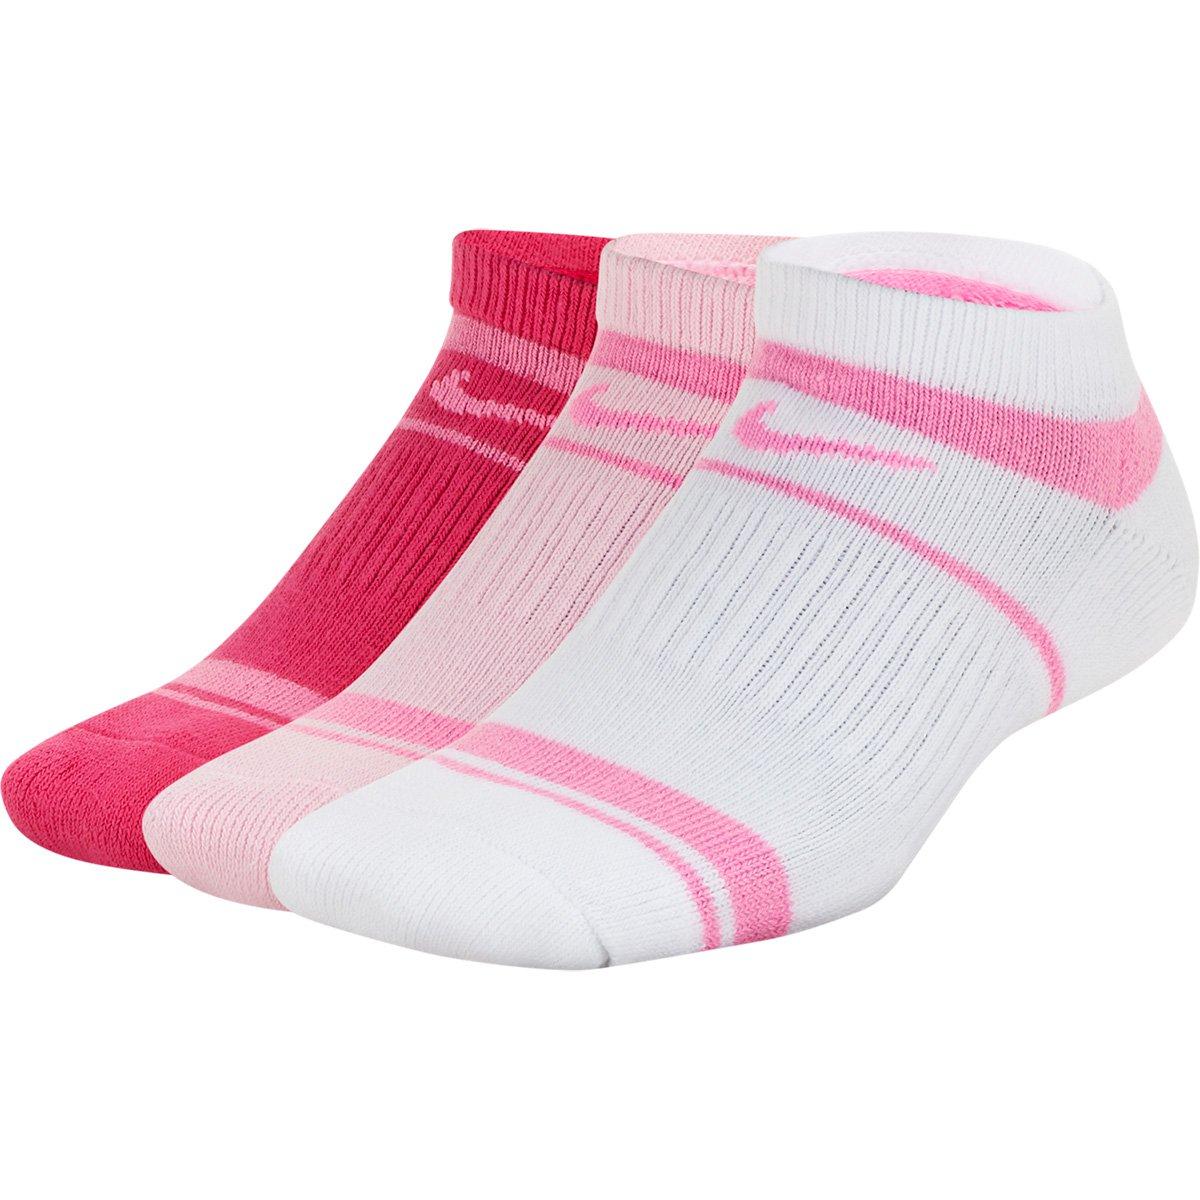 Kit Meia Infantil Nike Cano Curto Everyday Cush NS 3 Pares